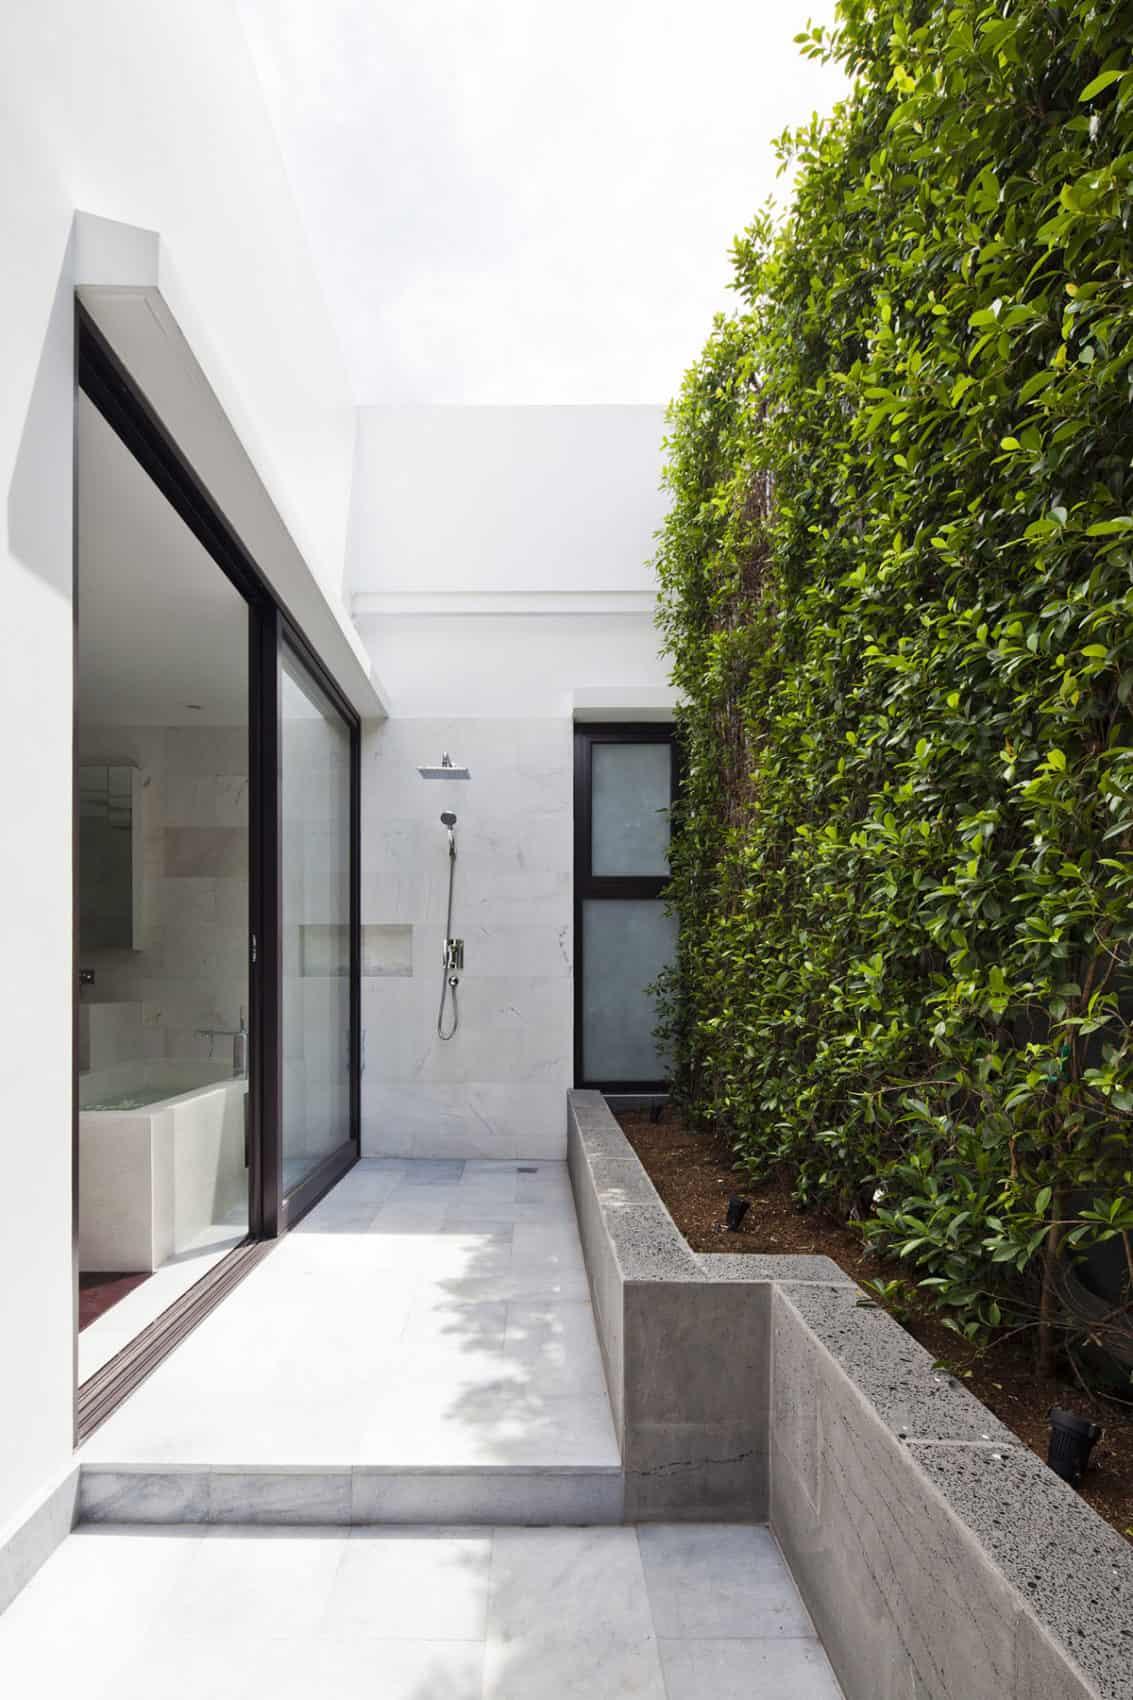 Private Villa Renovation by MM++ architects (9)